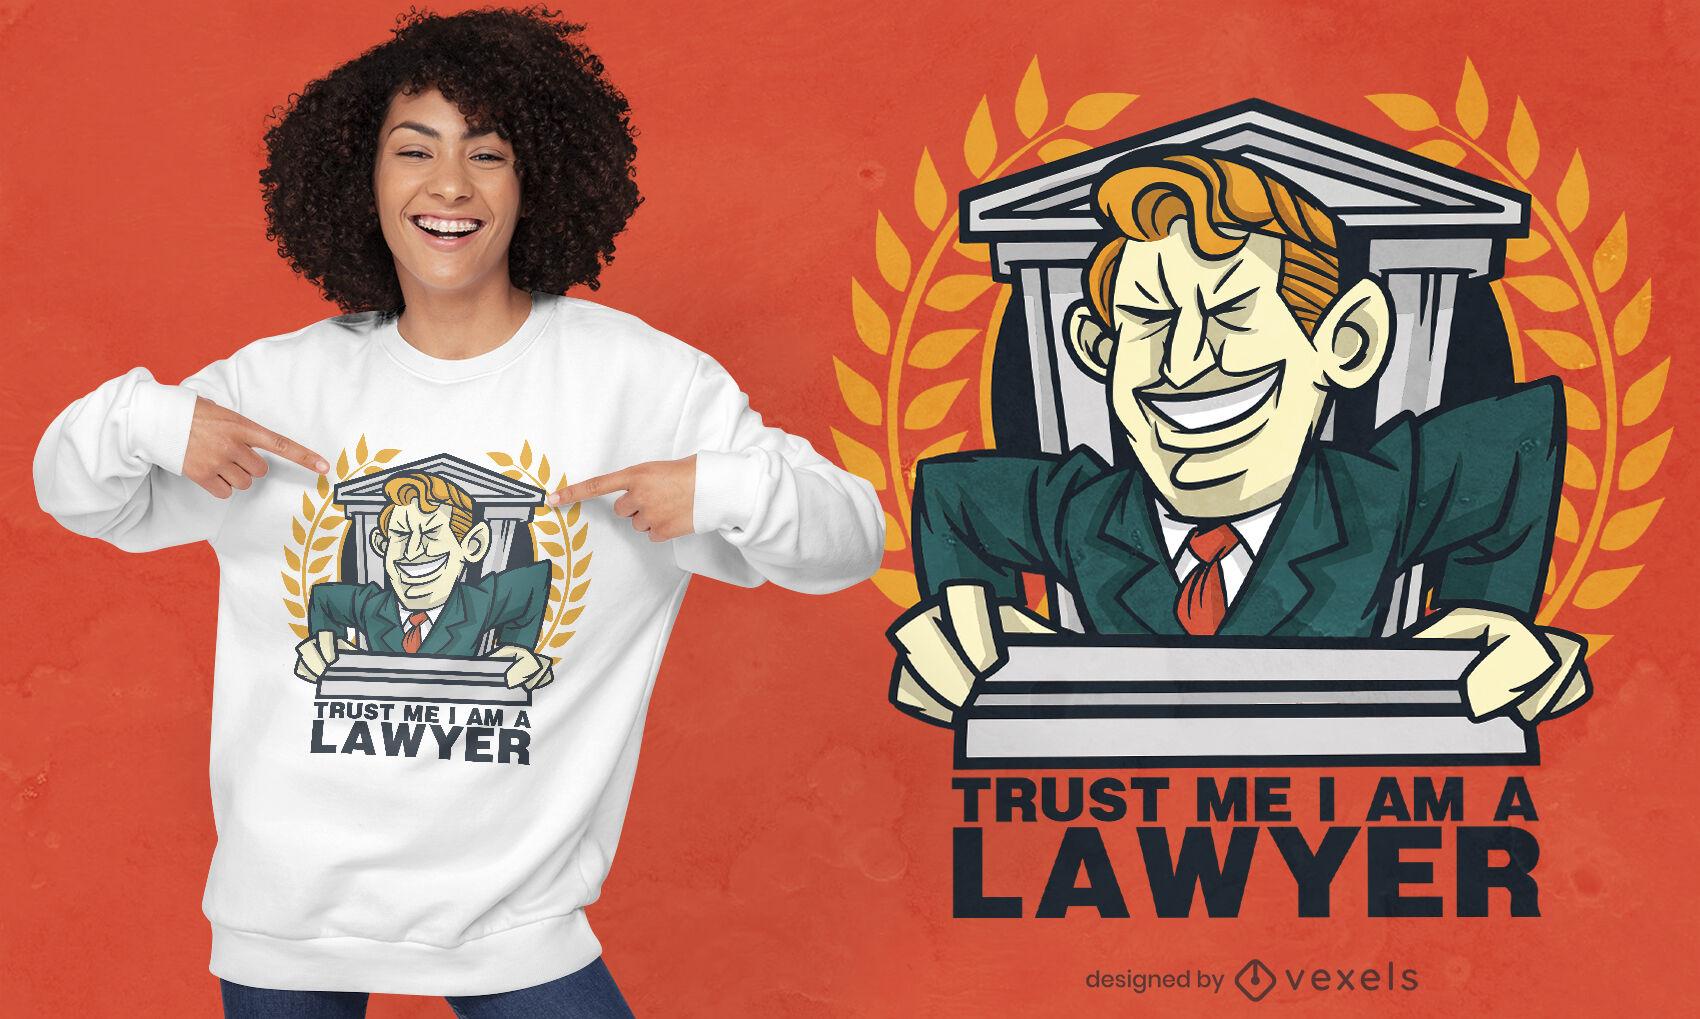 Diseño de camiseta de abogado de dibujos animados